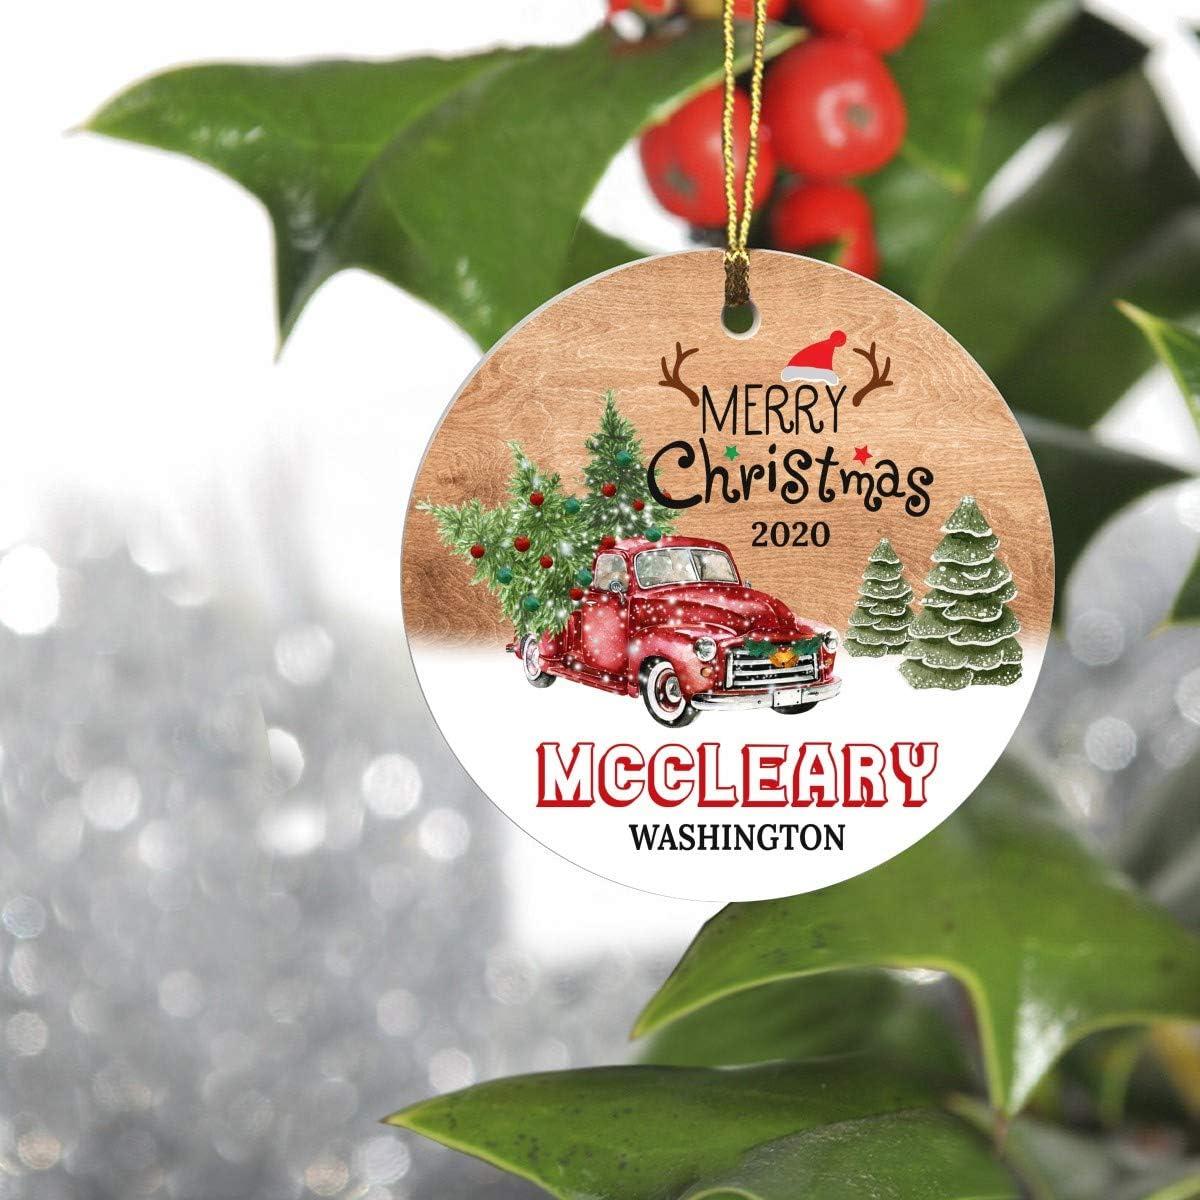 Merry Christmas Tree Decorations Ornaments 2020 - Ornament Hometown McCleary Washington WA State - Keepsake Gift Ideas Ornament 3